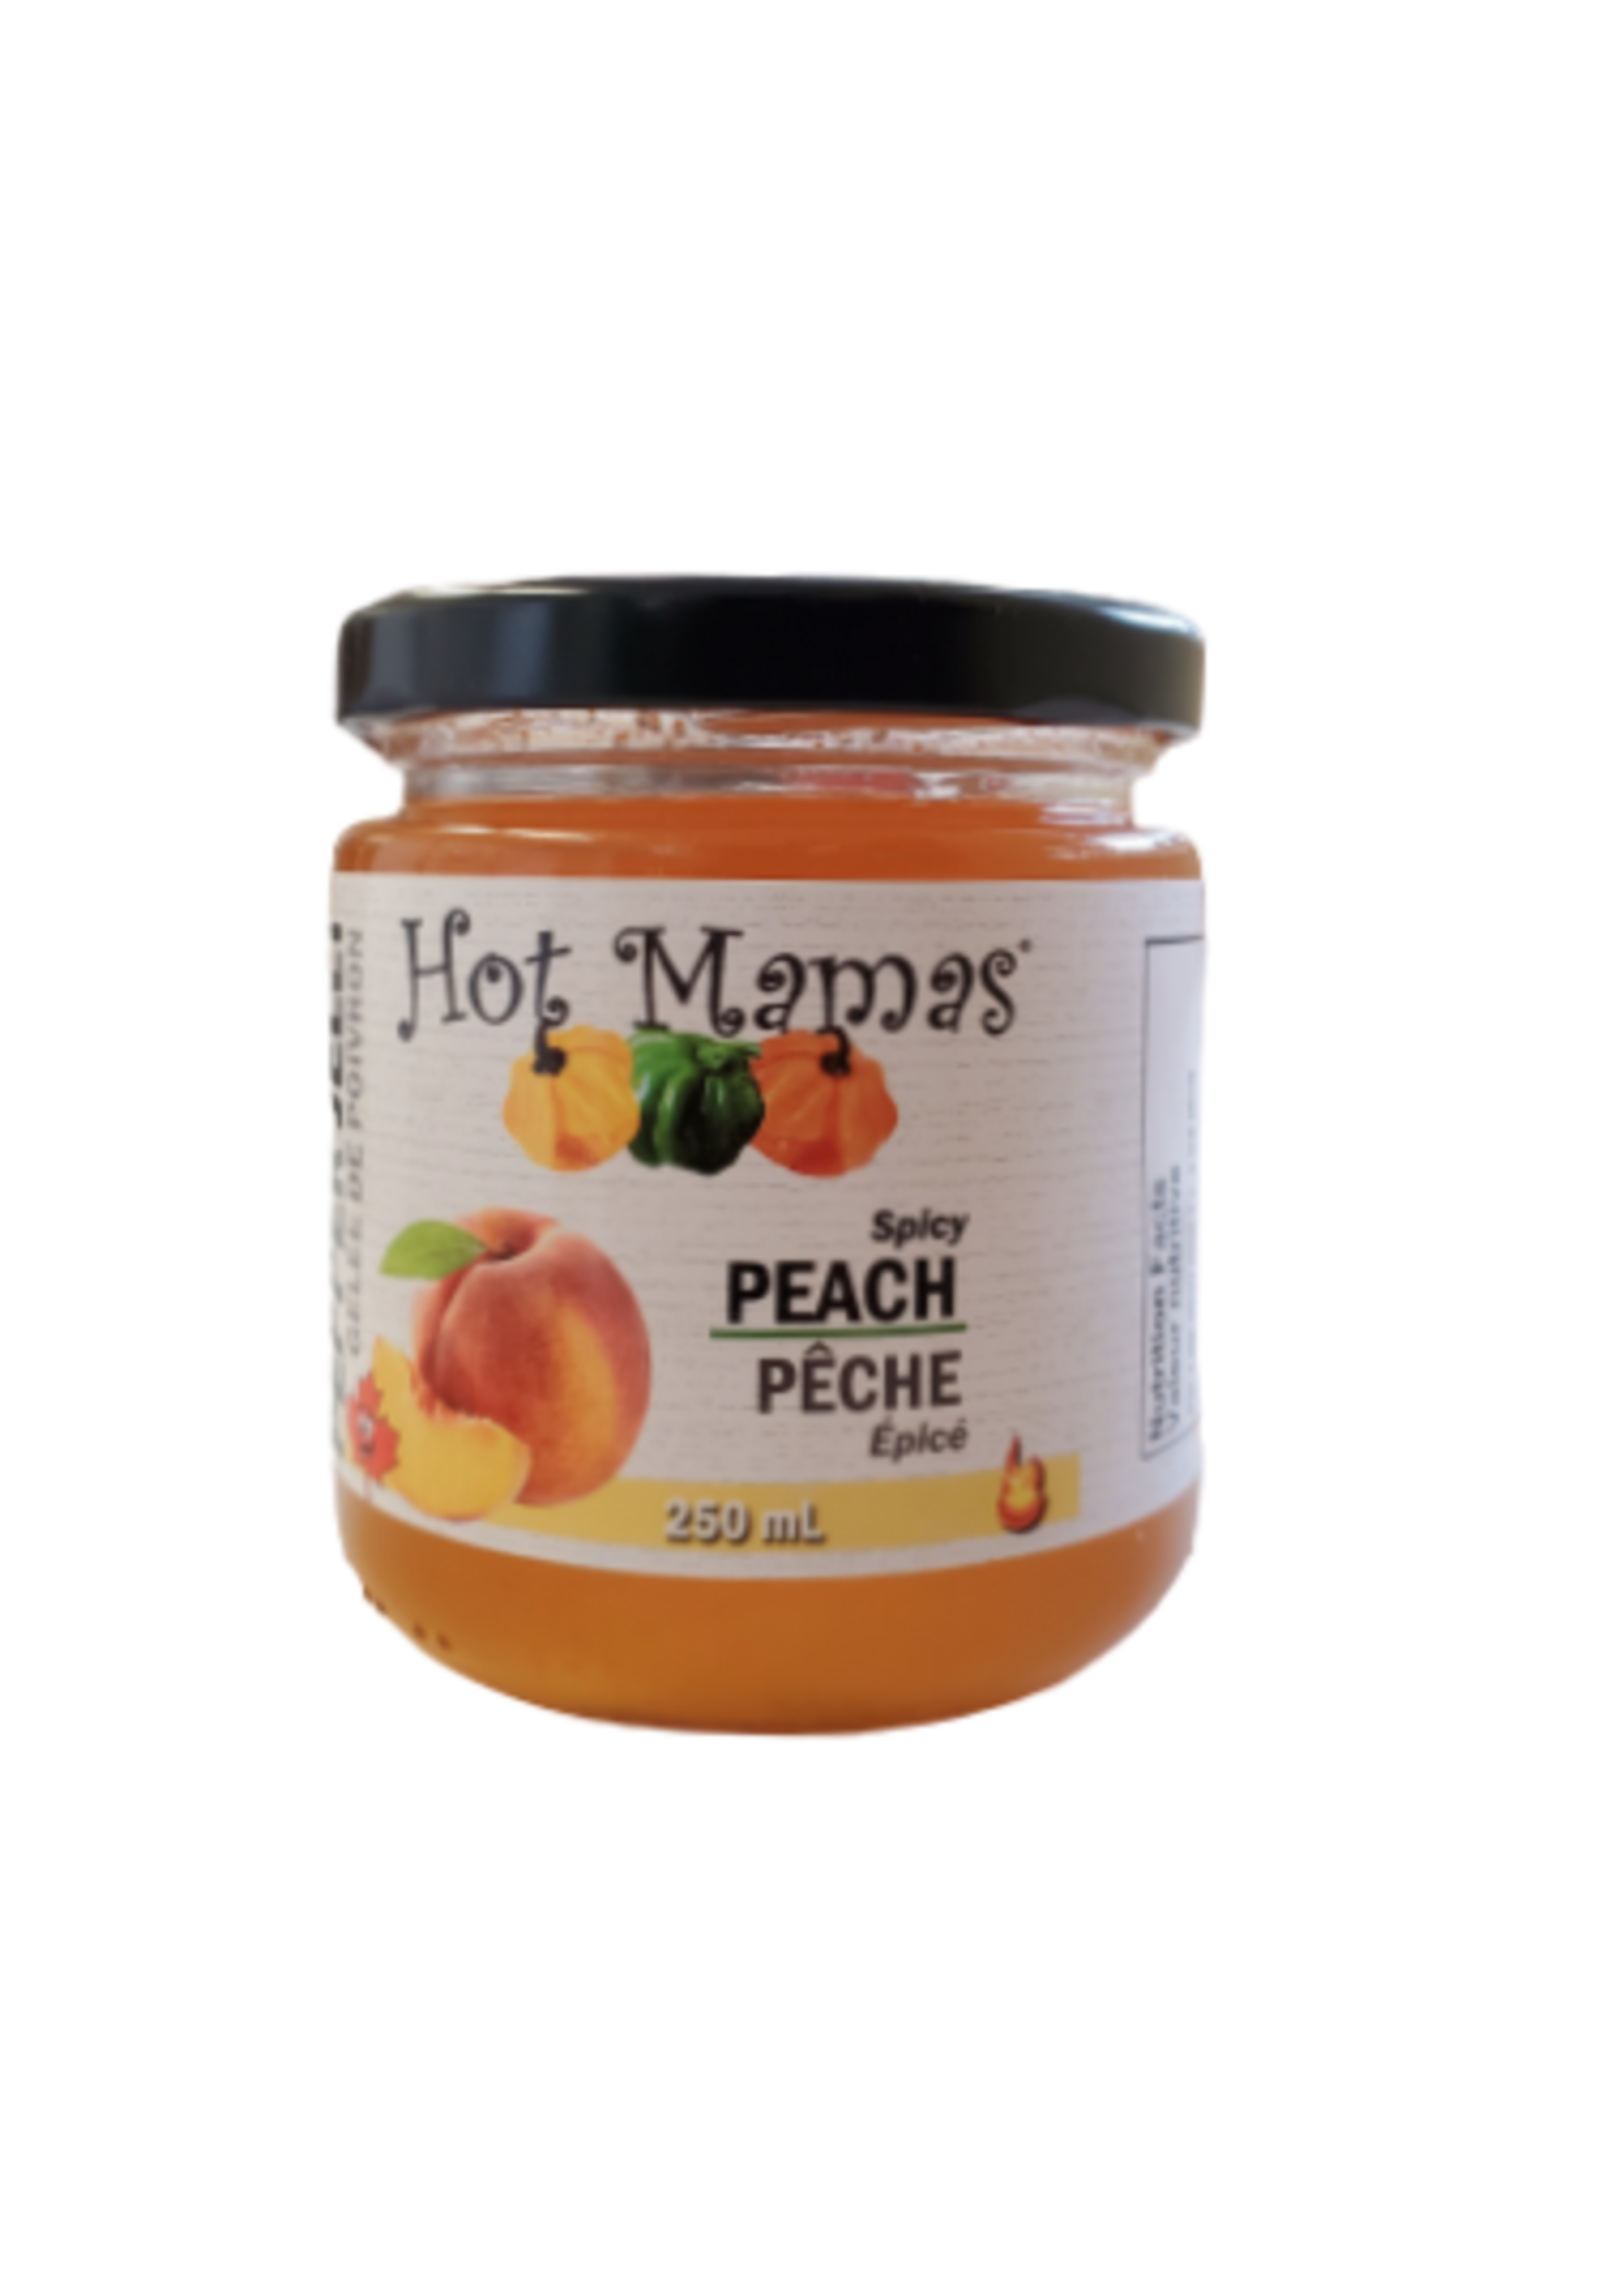 Hot Mamas Peach Pepper Jelly 250ml